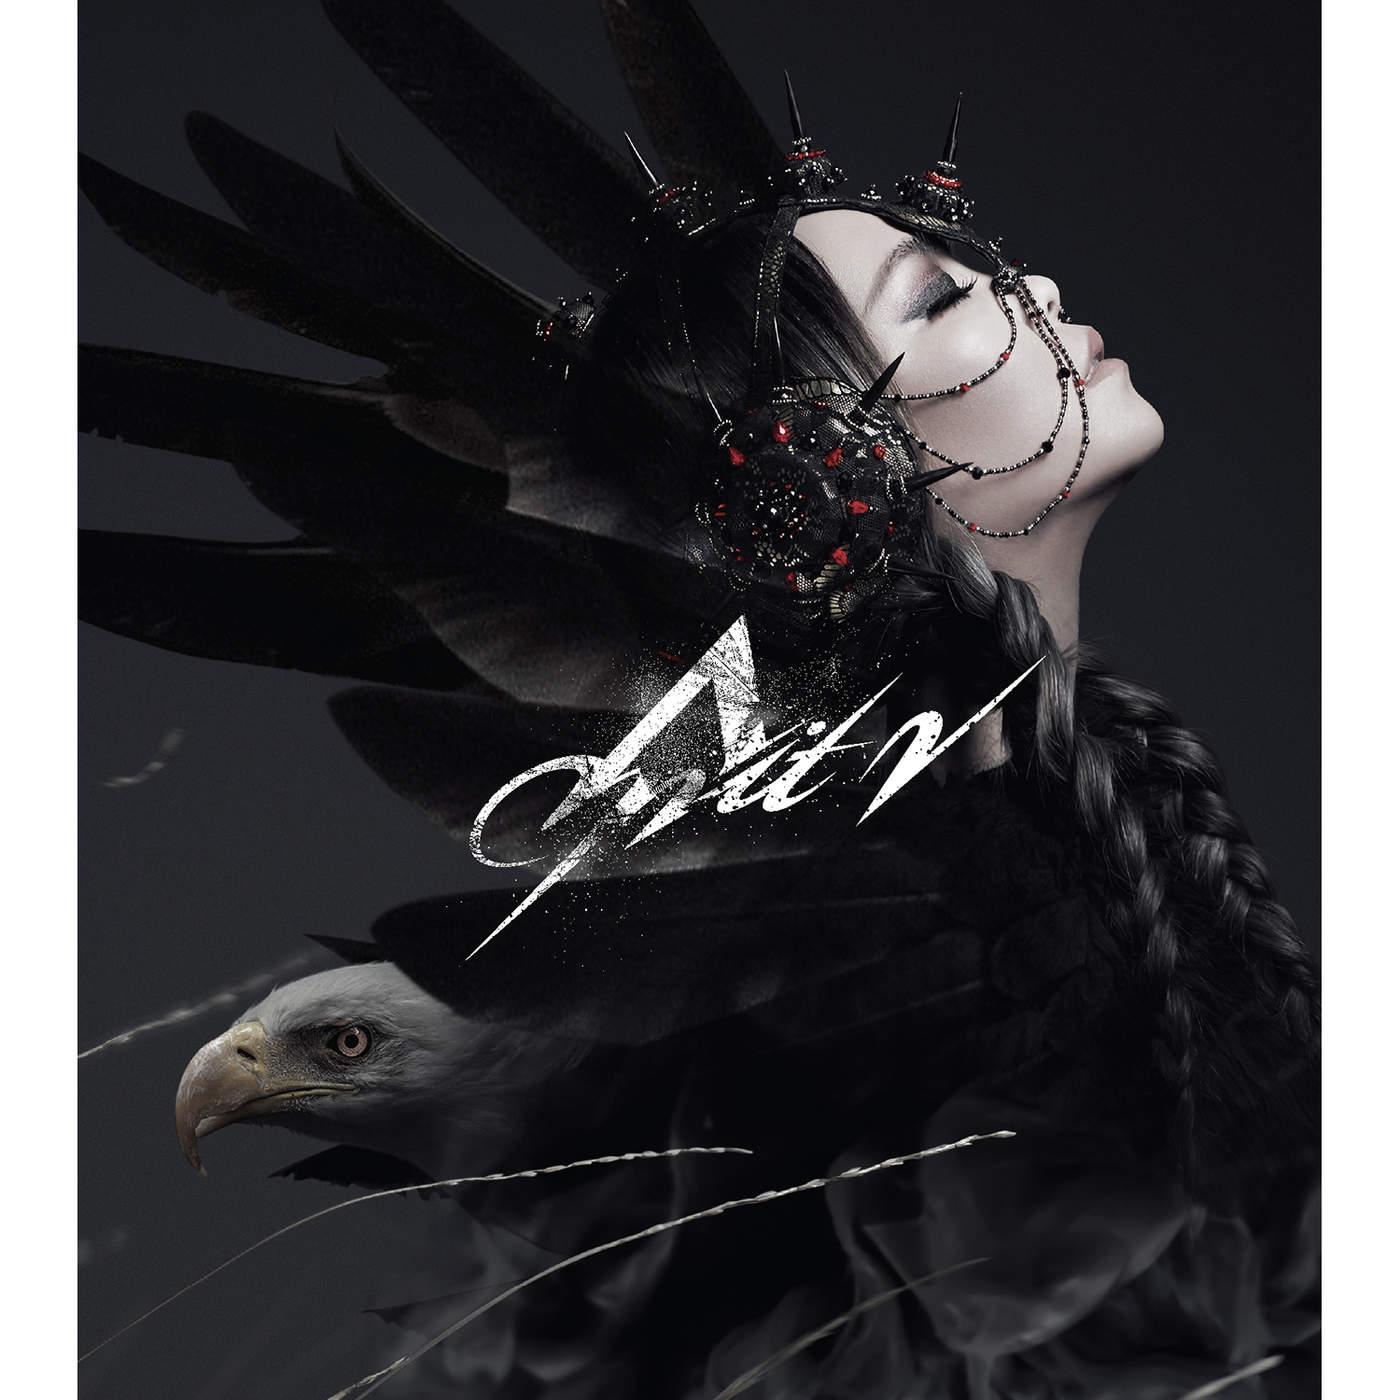 [Album] 阿密特2 / AMIT2 - 張惠妹 A-mei/A-mit